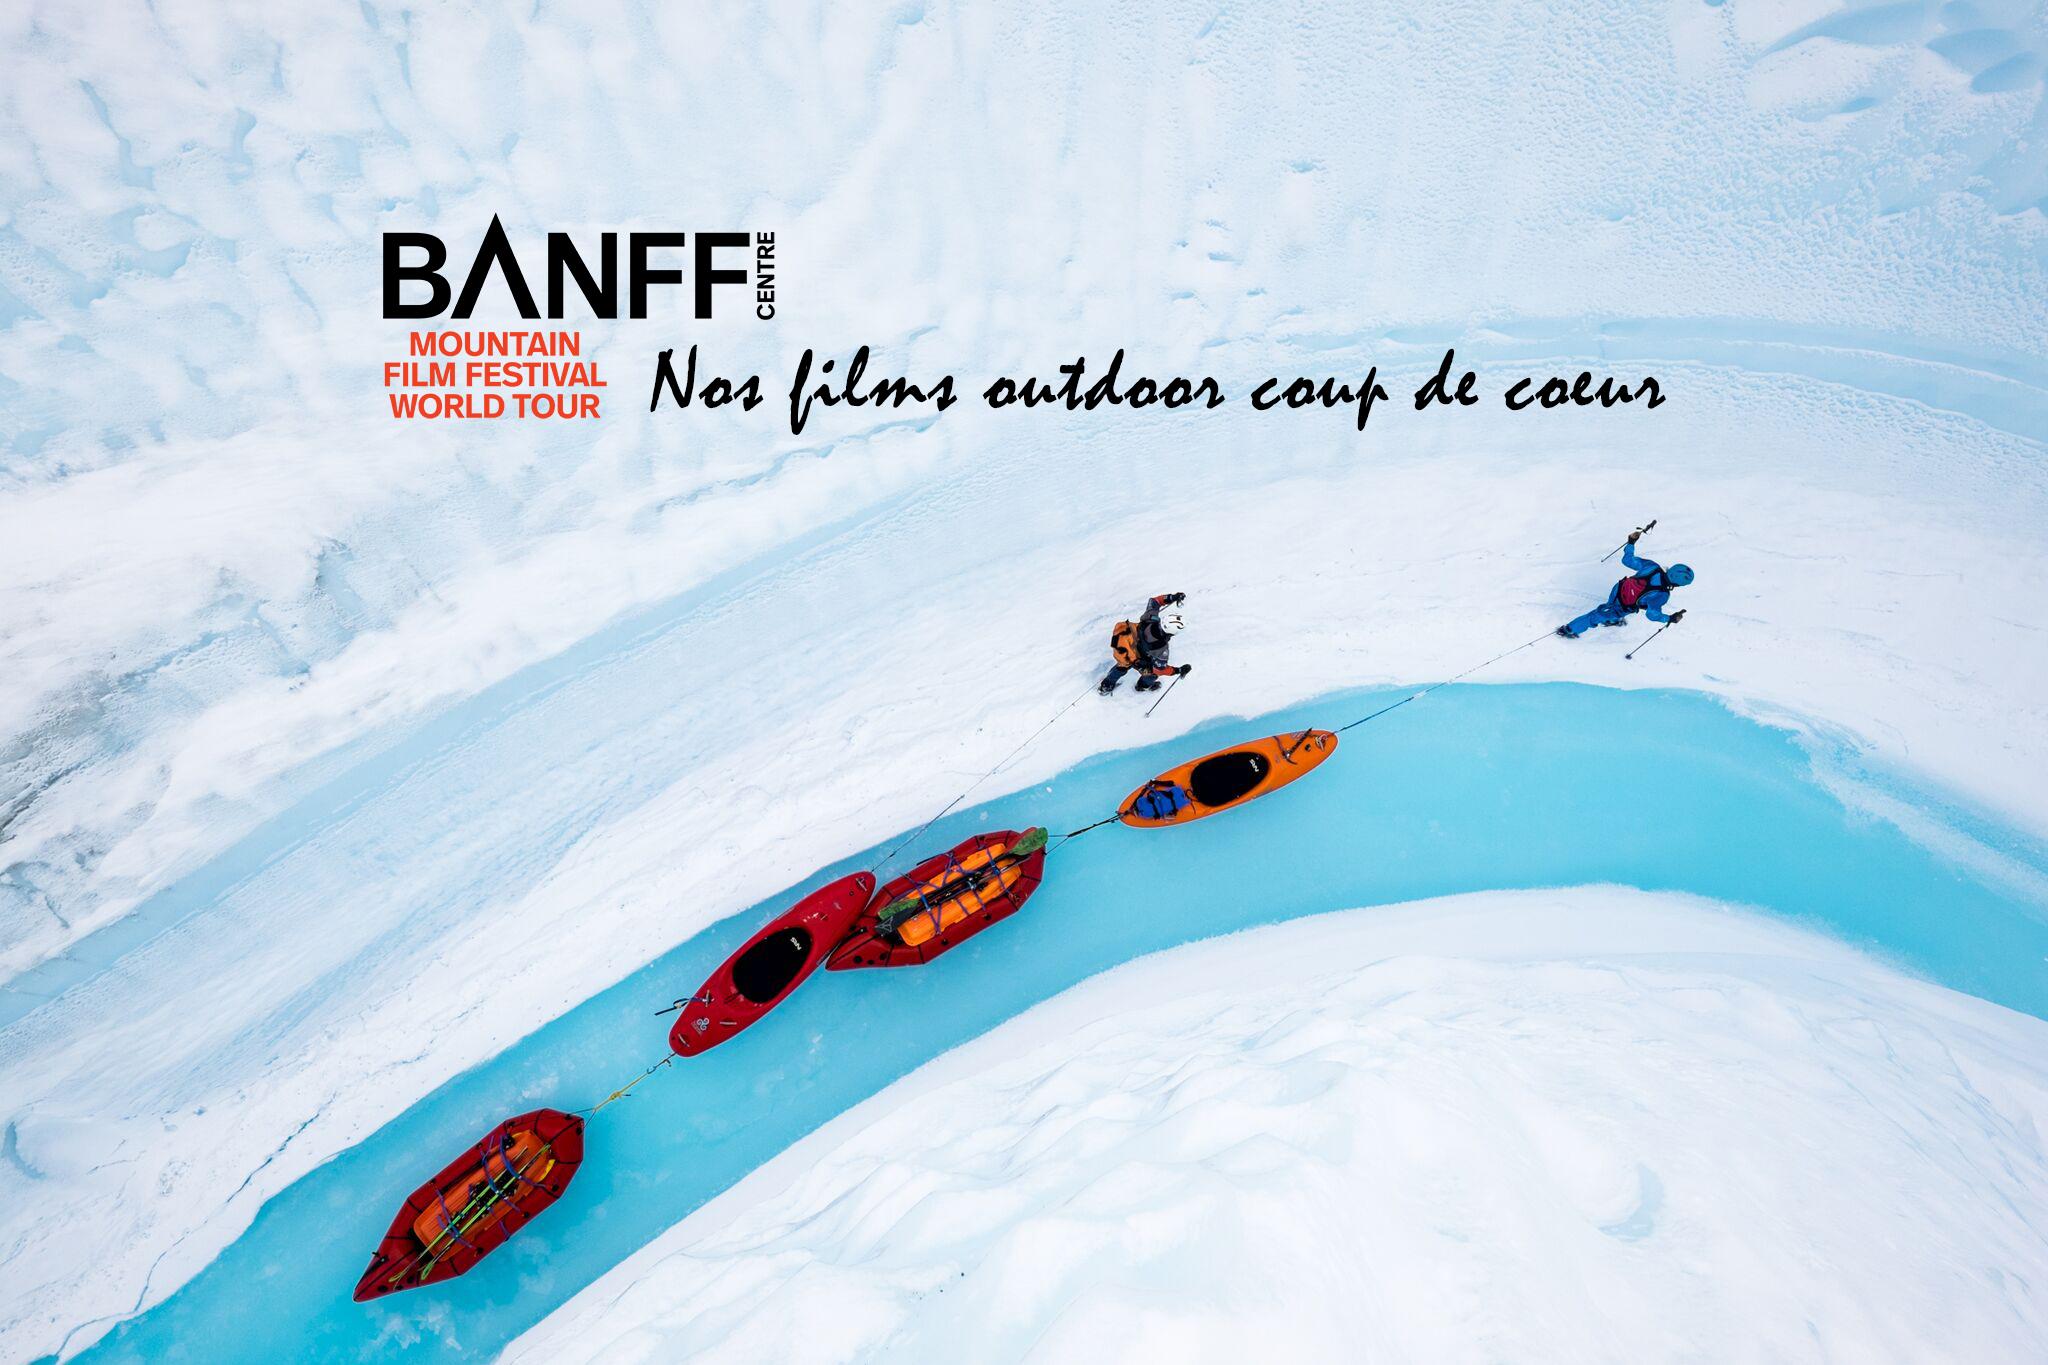 Banff Film Festival